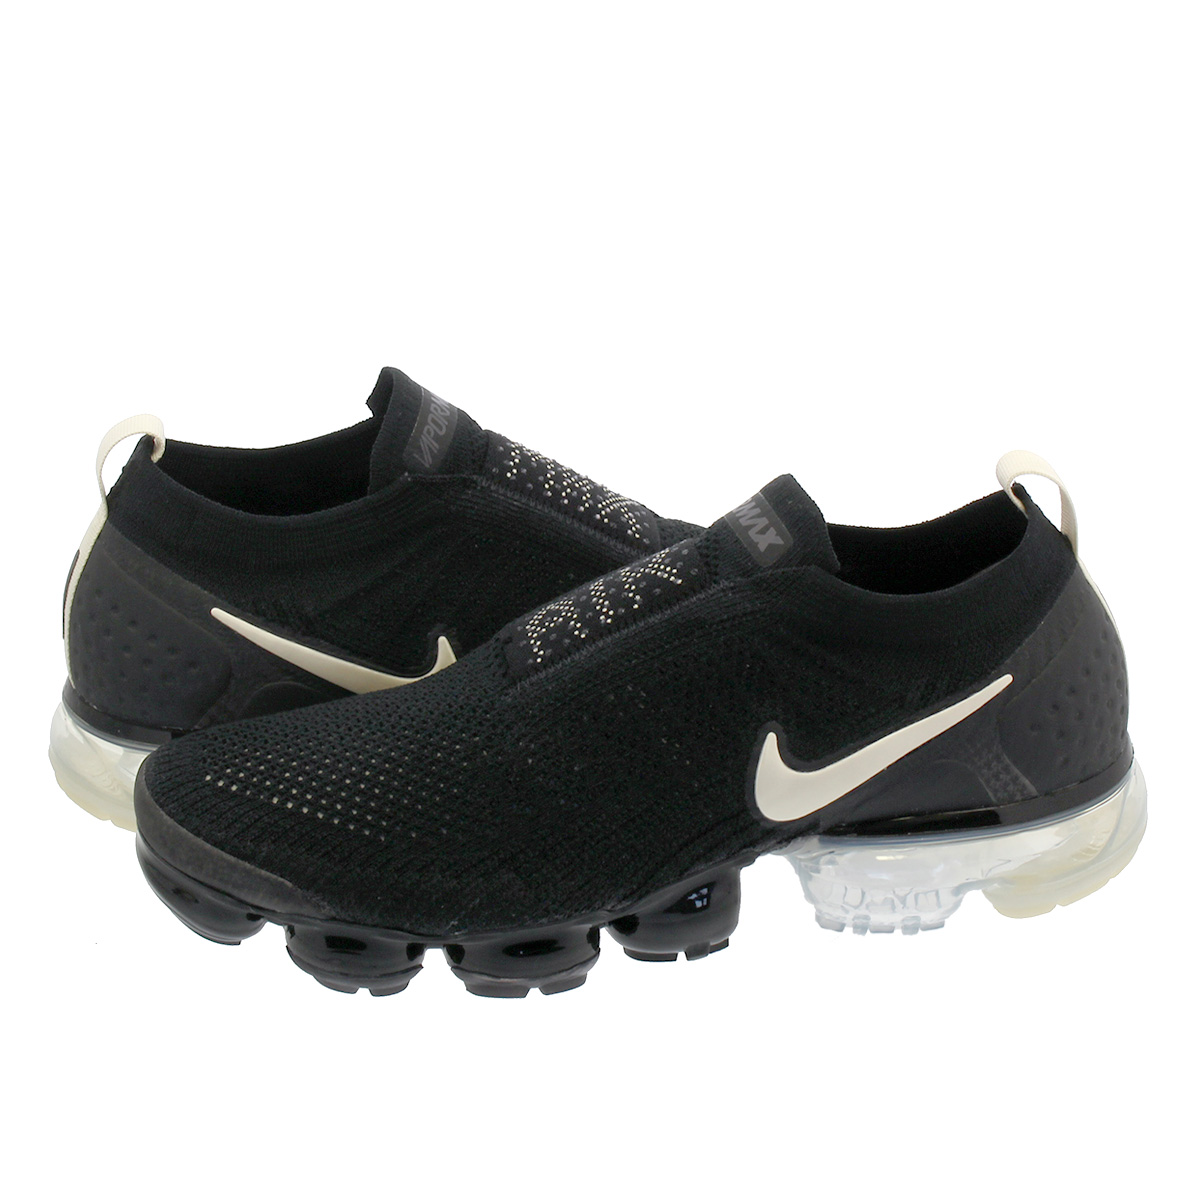 2b542bfbba59 NIKE AIR VAPORMAX MOC 2 Nike air vapor max fried food knit mock 2 BLACK LIGHT  CREAM WHITE THUNDER GREY ah7006-002